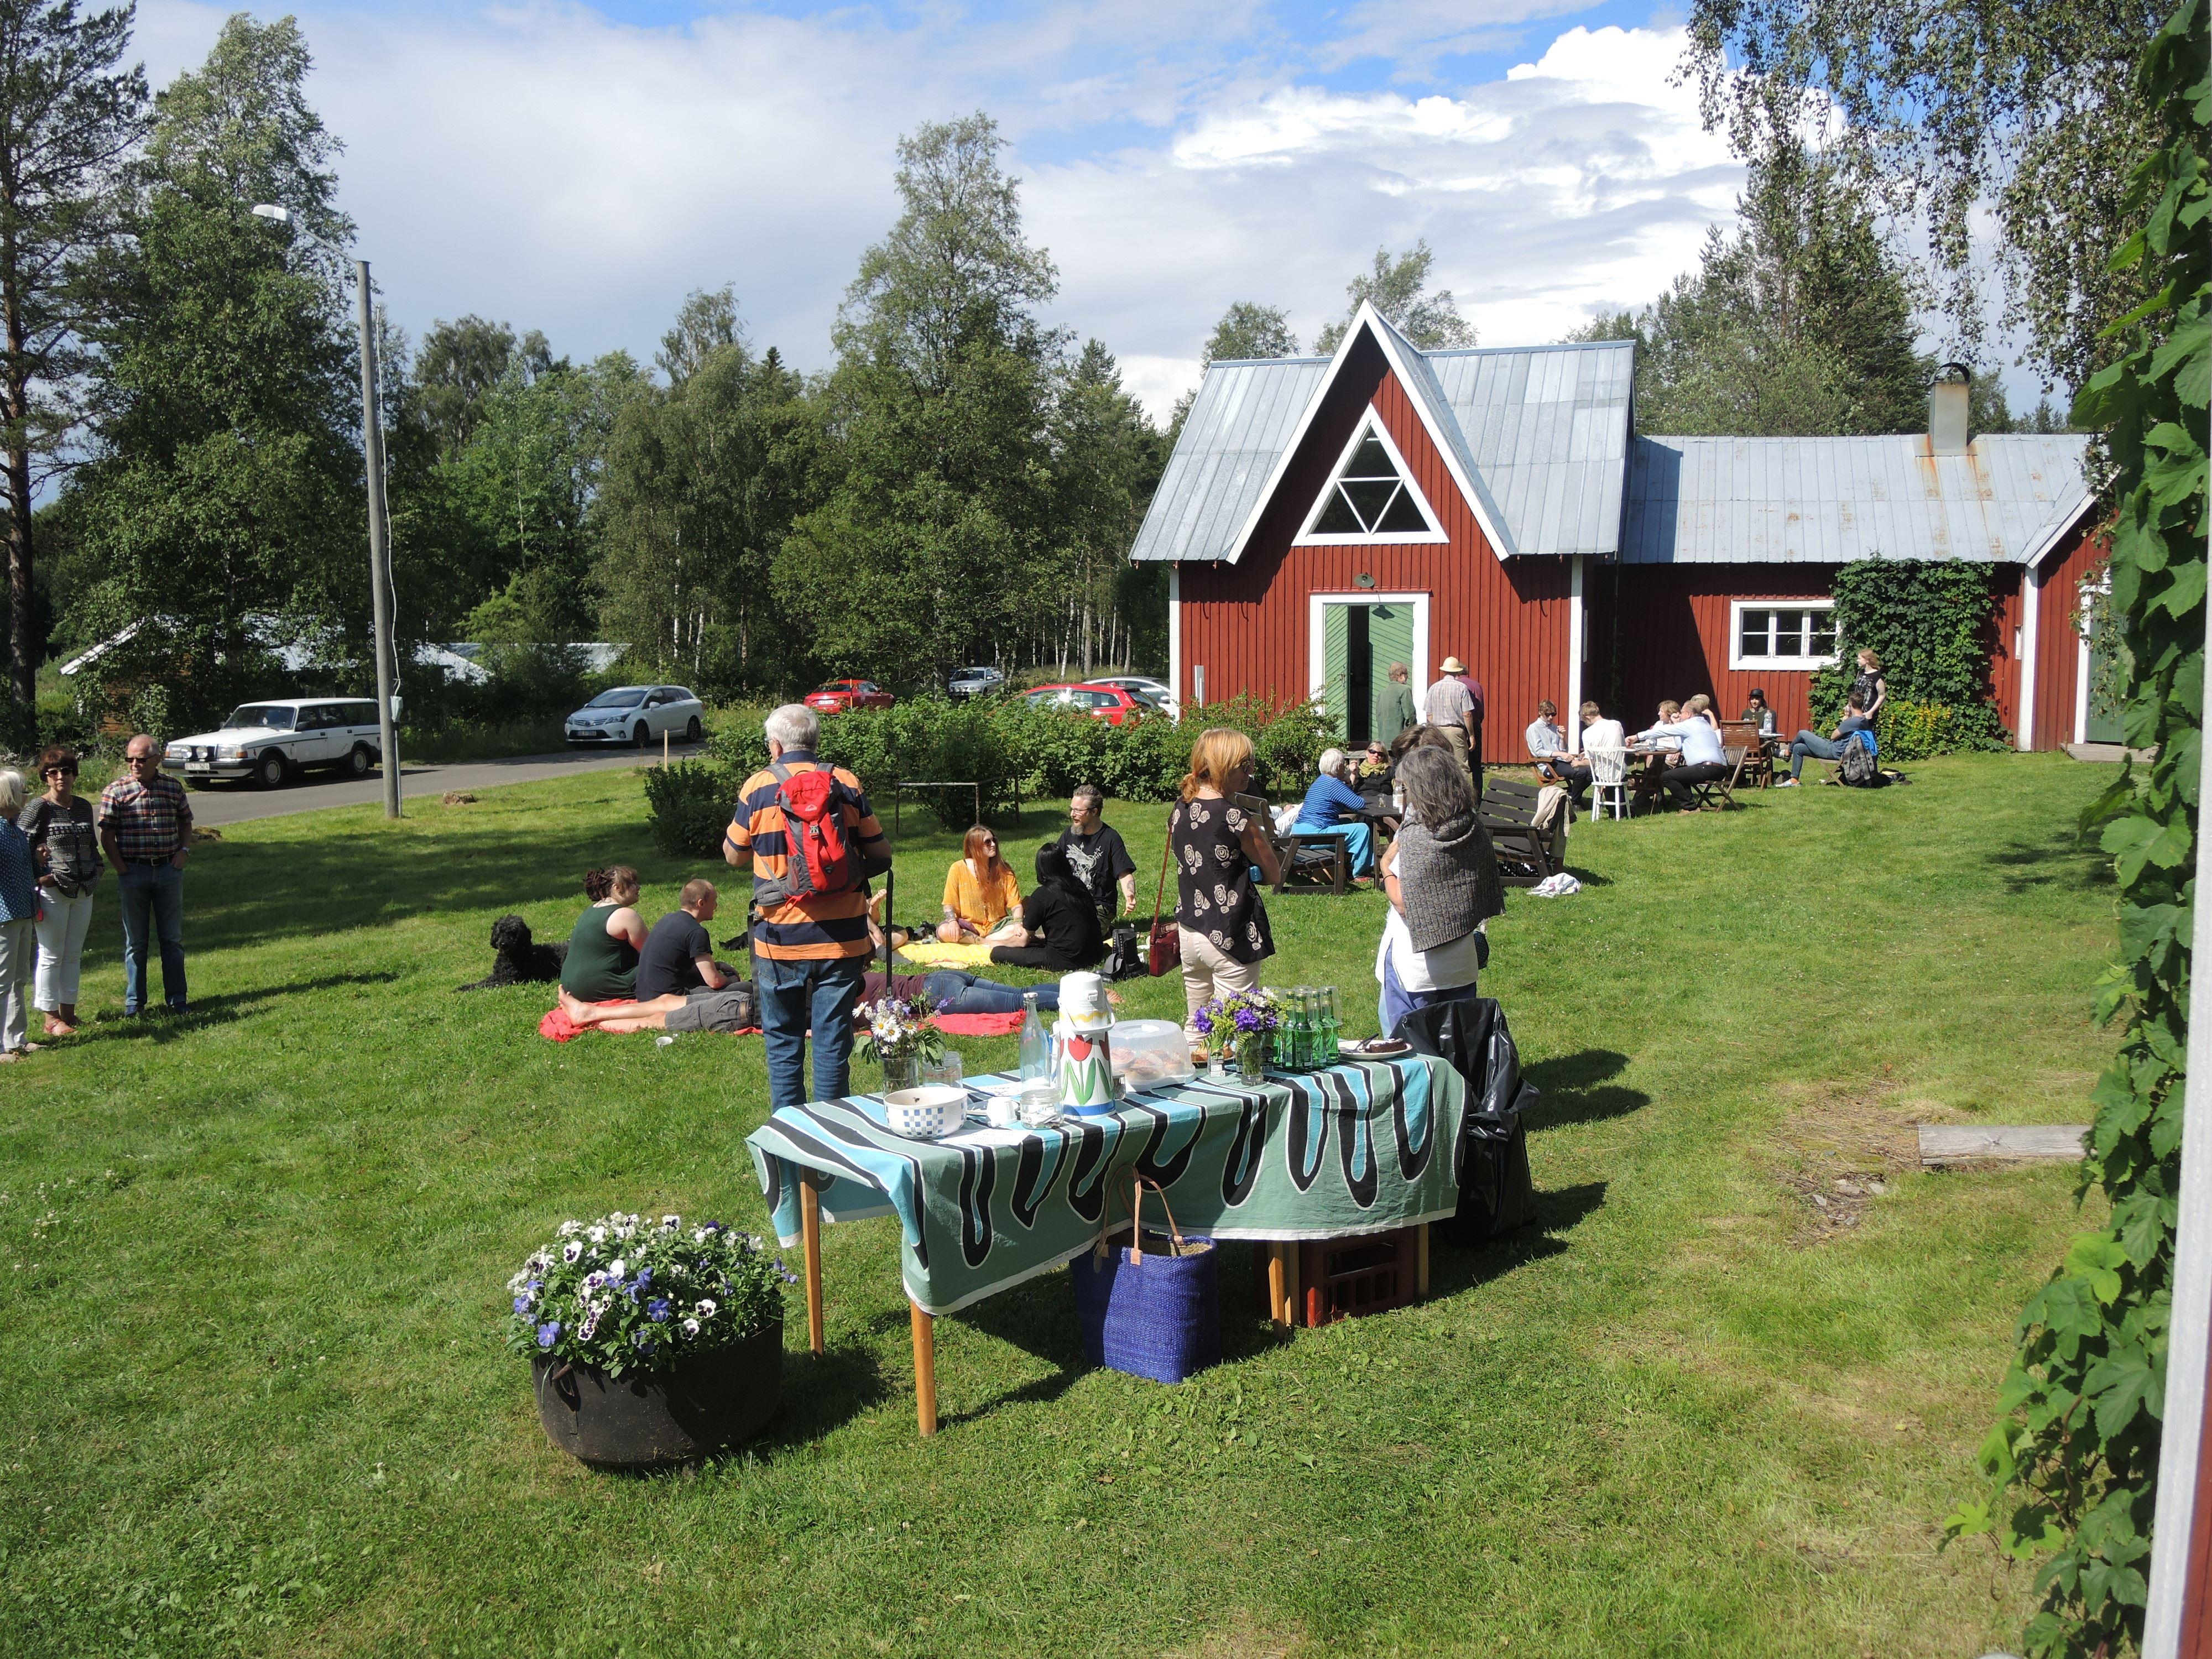 Katrin Zackrisson Caldeborg,  © Katrin Zackrisson Caldeborg, Utställning 9 juli-1 aug 2016